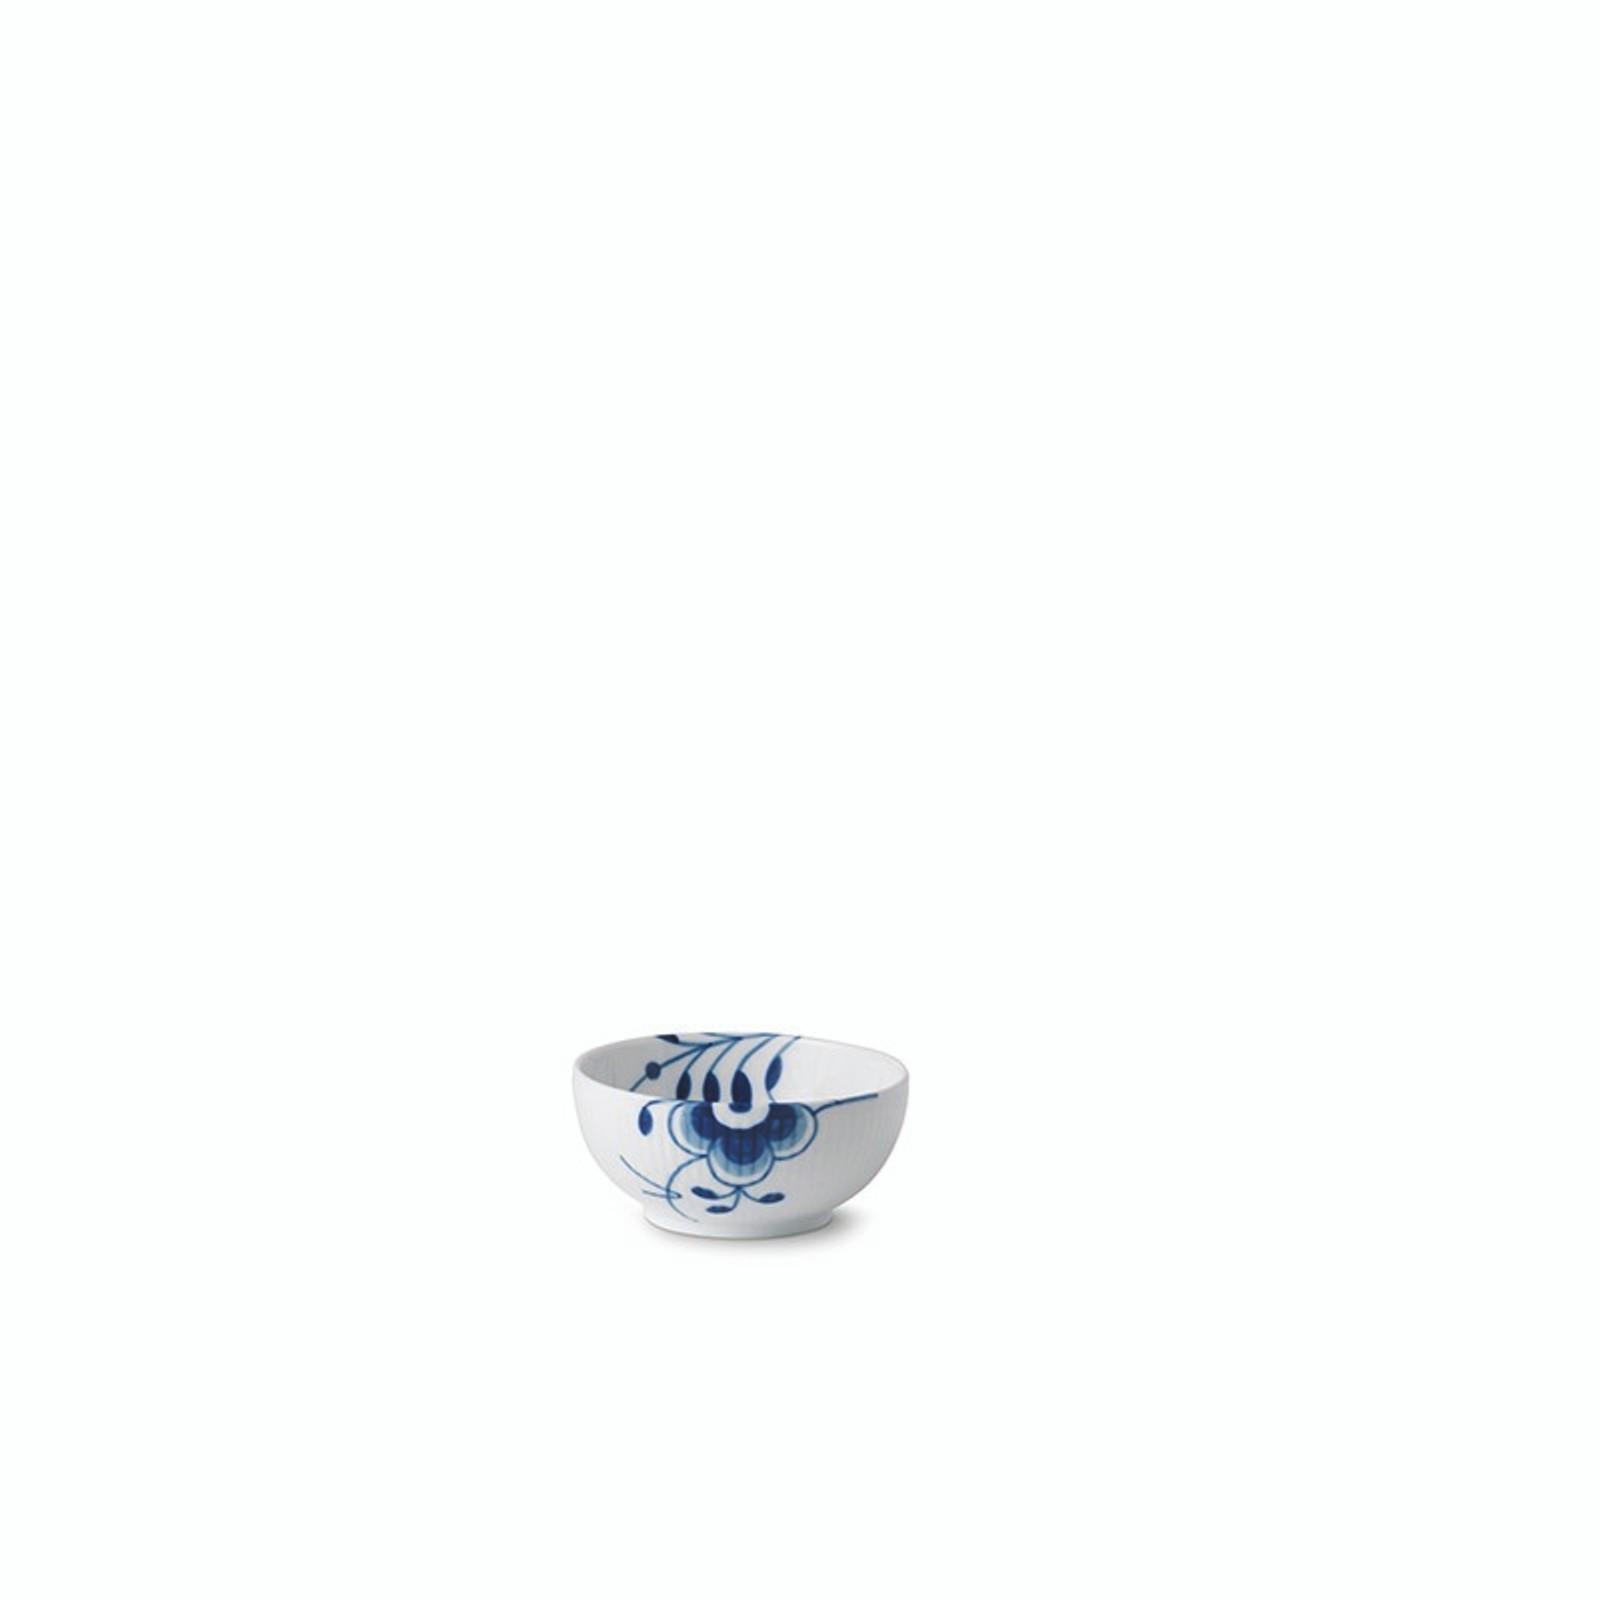 Royal Copenhagen Blue Fluted Mega - Small Bowl, 8 oz (1027459)